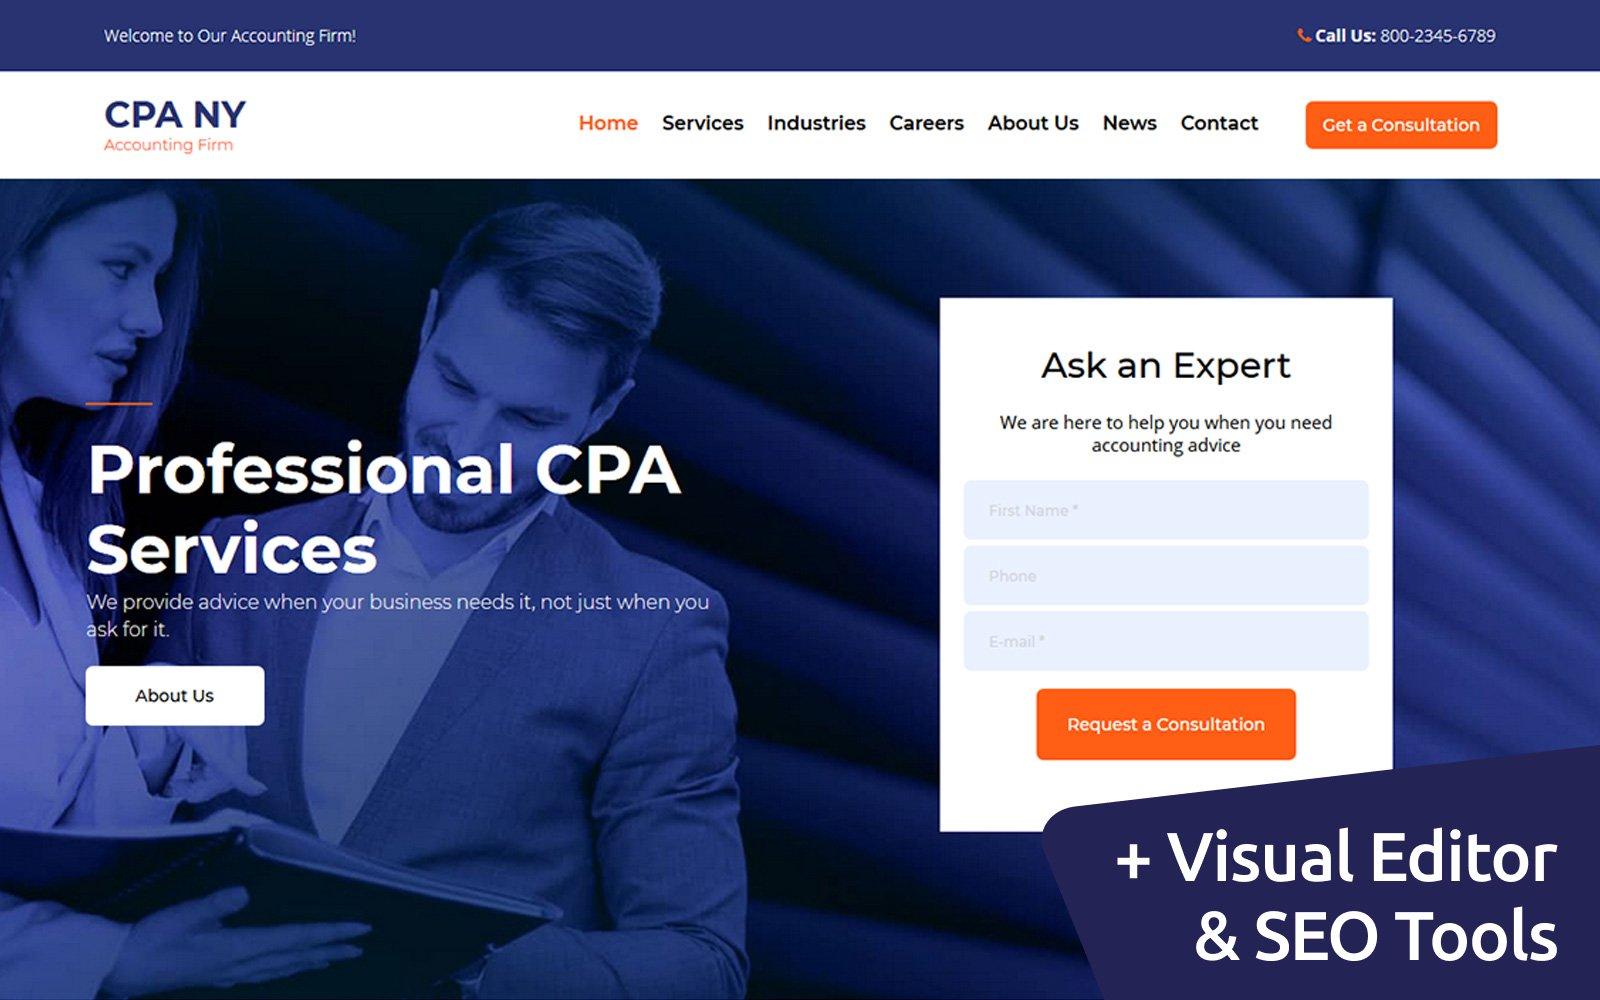 """CPA NY - Accounting Firm"" modèle Moto CMS 3 adaptatif #111047"